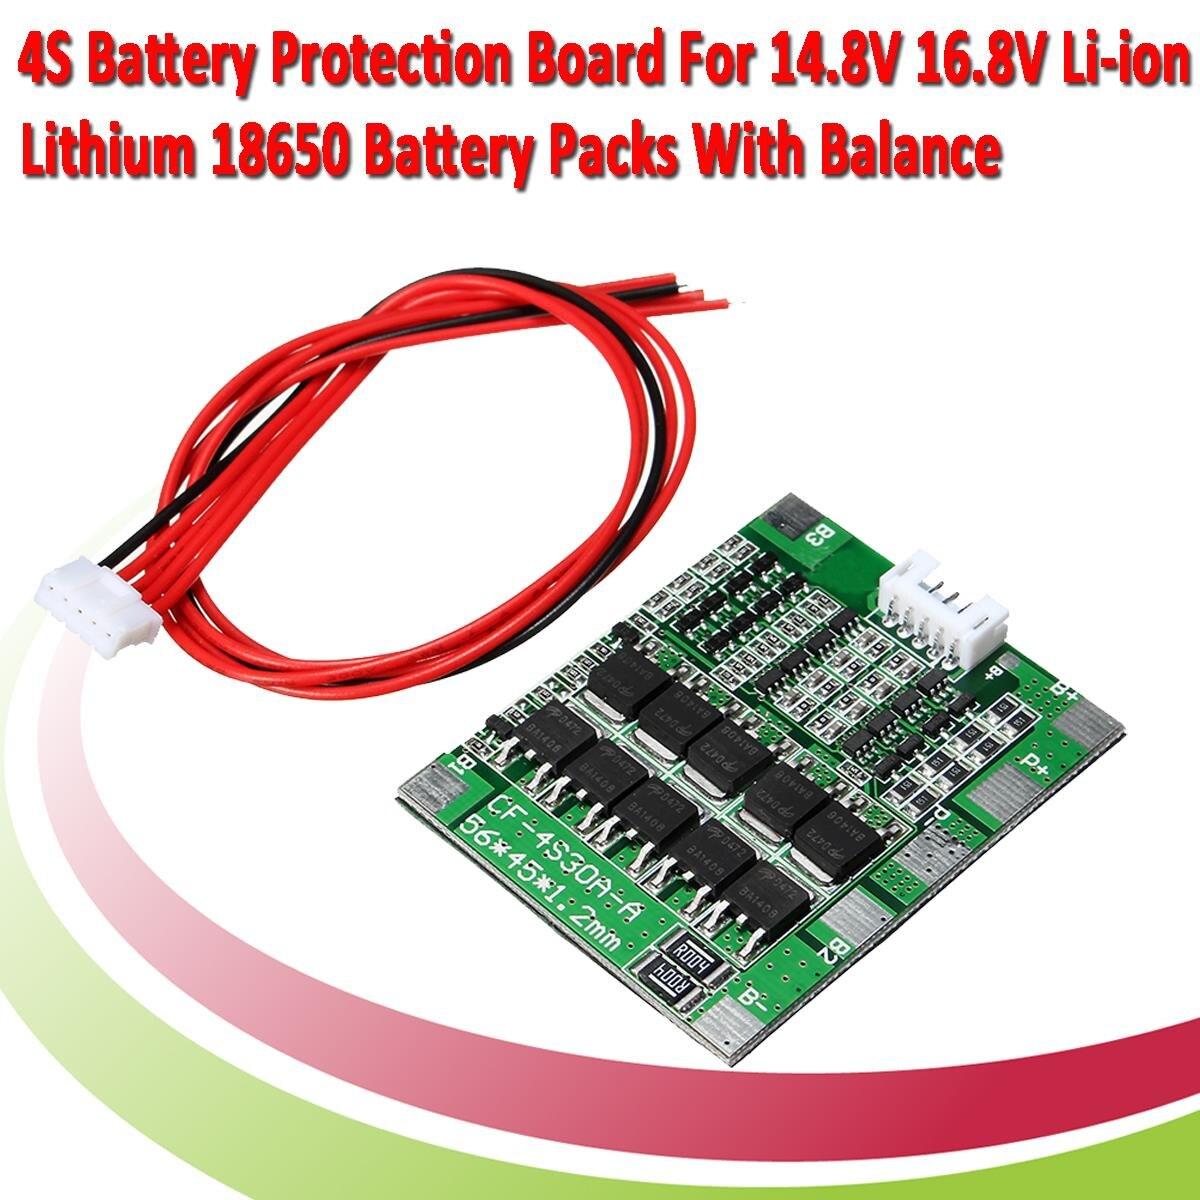 4s 30a 148 V Li Ion Lithium 18650 Batterie Bms Packs Pcb Protection 4v Circuit Board Battery Croons 74v Balance Intgr Circuits 45x56mm Carte Lectronique Dans Intgrs De